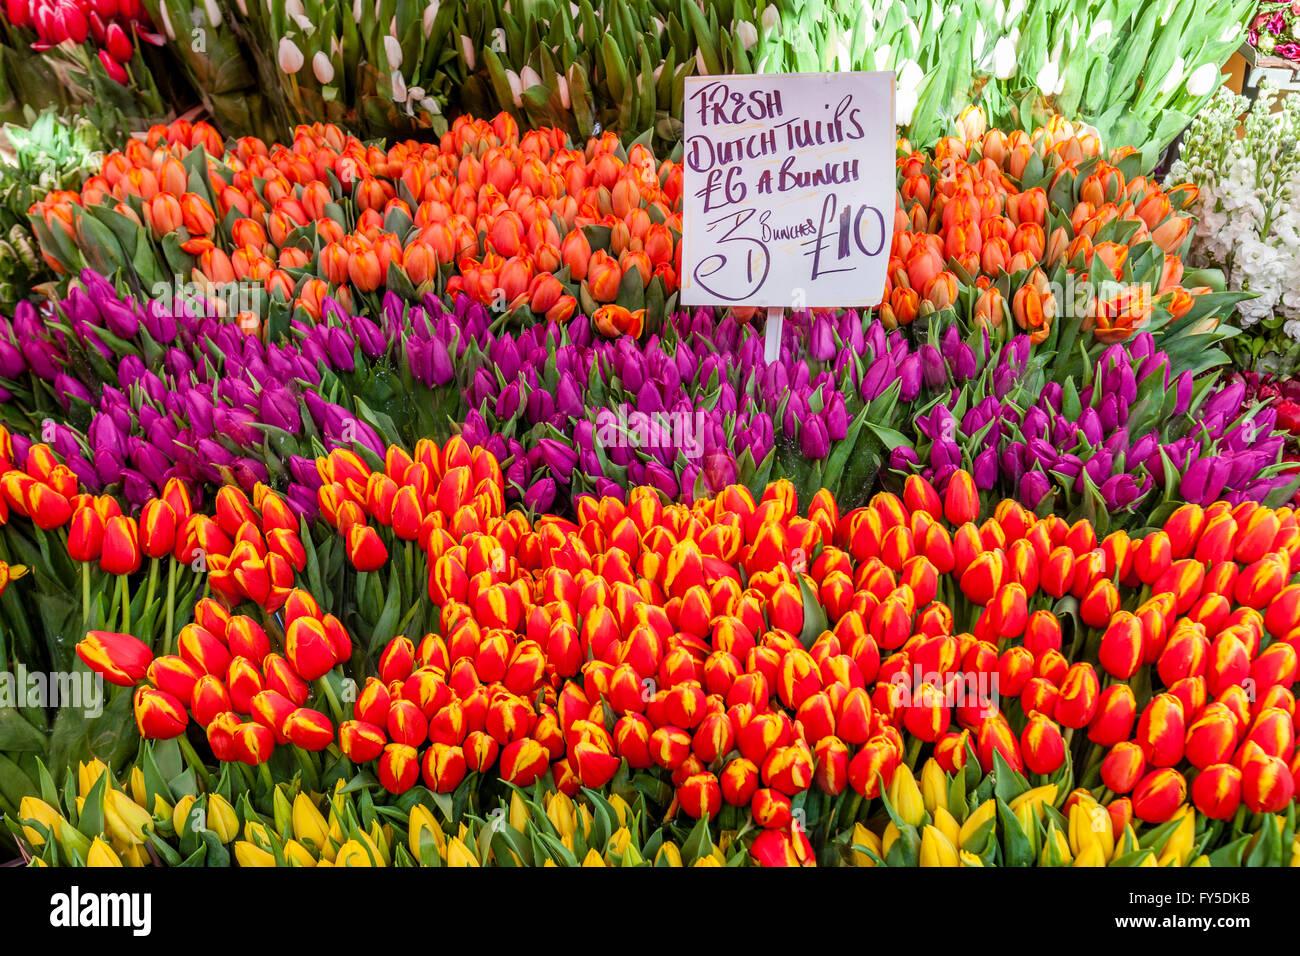 Tulipes pour vente, Columbia Road Flower Market, Tower Hamlets, London, England Photo Stock